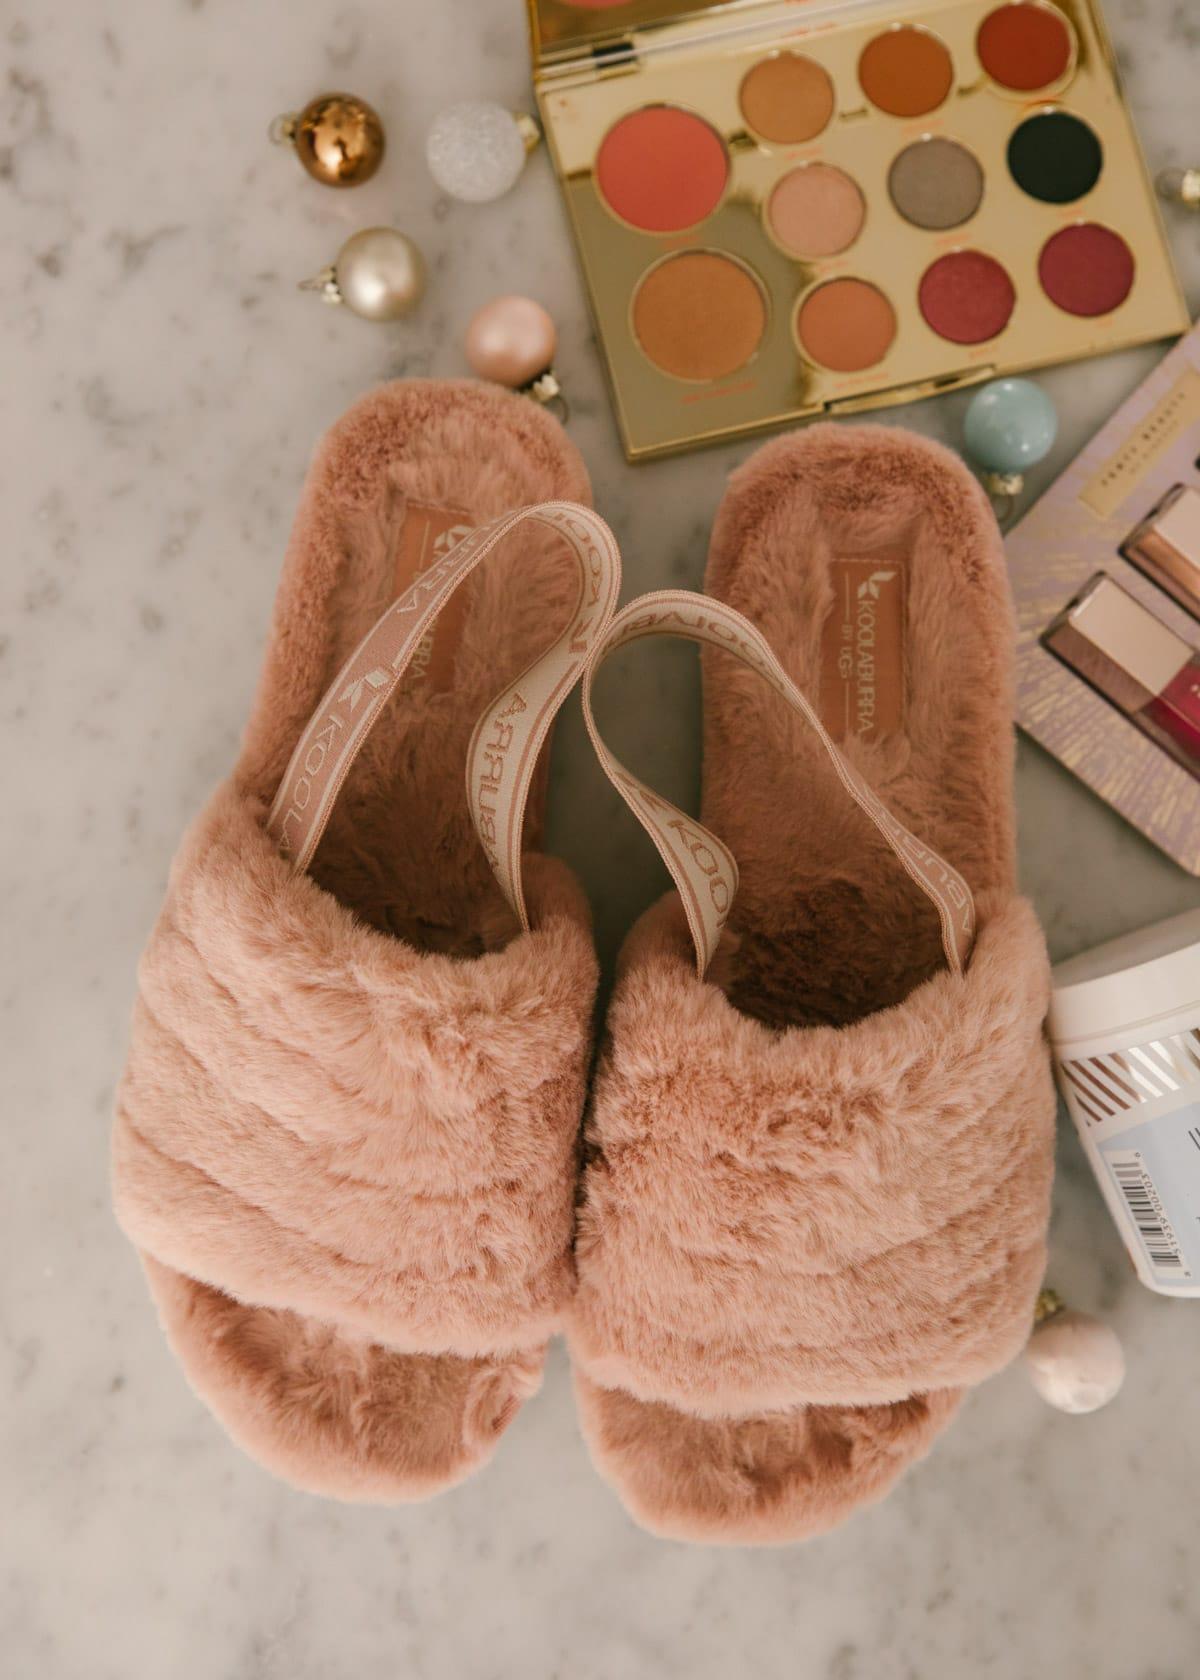 ugg slippers christmas gift